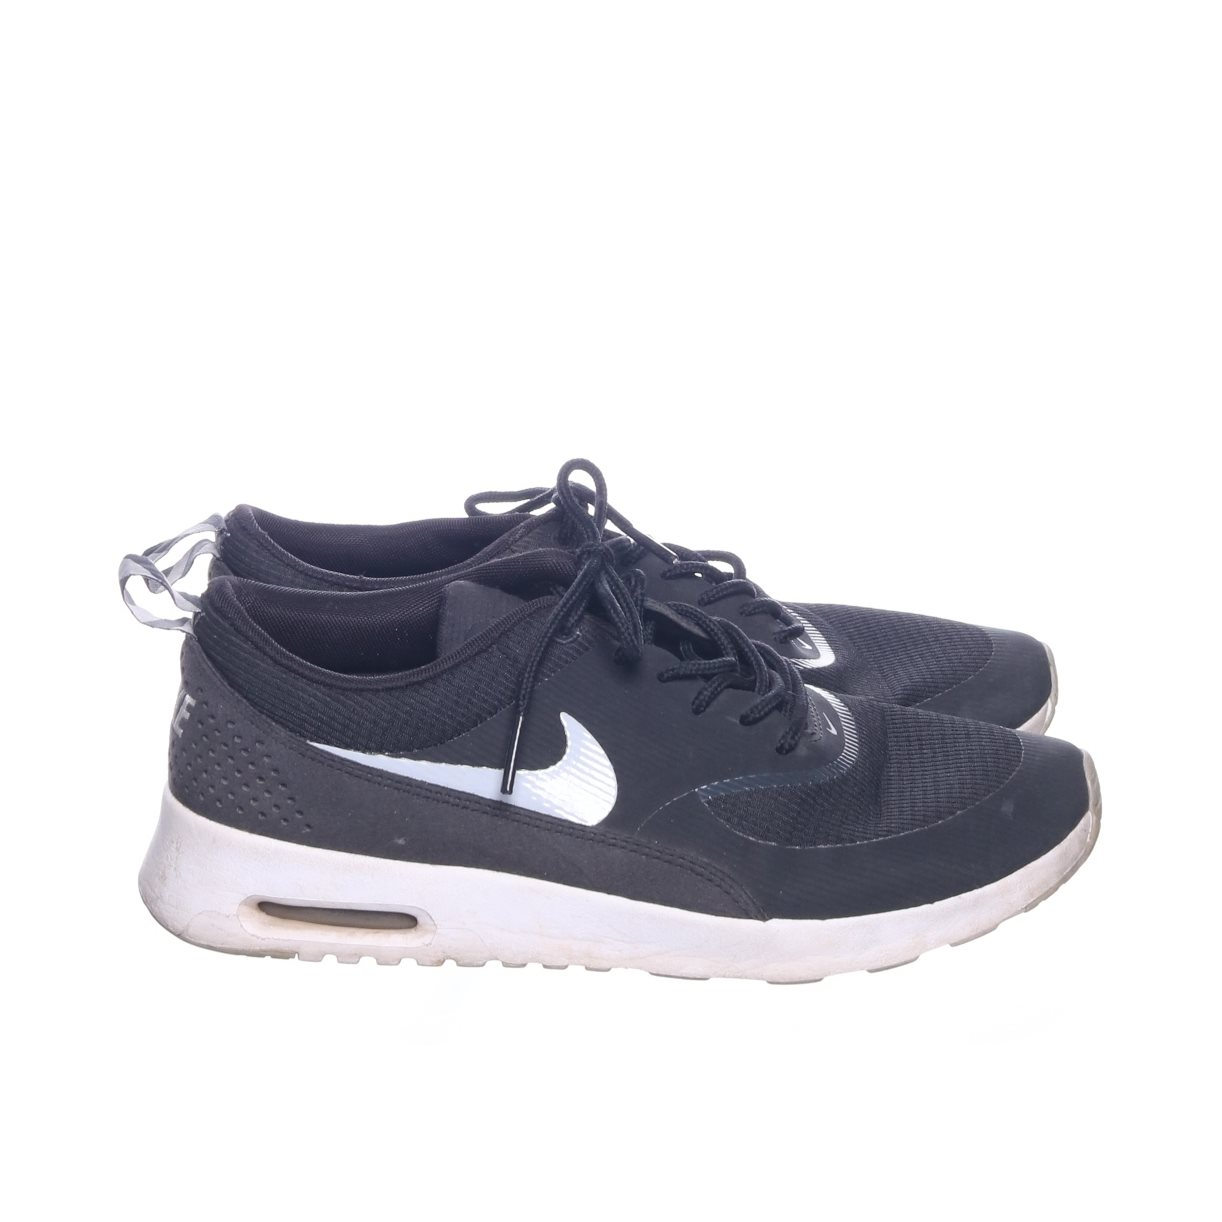 best website a1c8b 4ab22 Nike, Sneakers, Strl  38,5, Air Max Thea, Svart